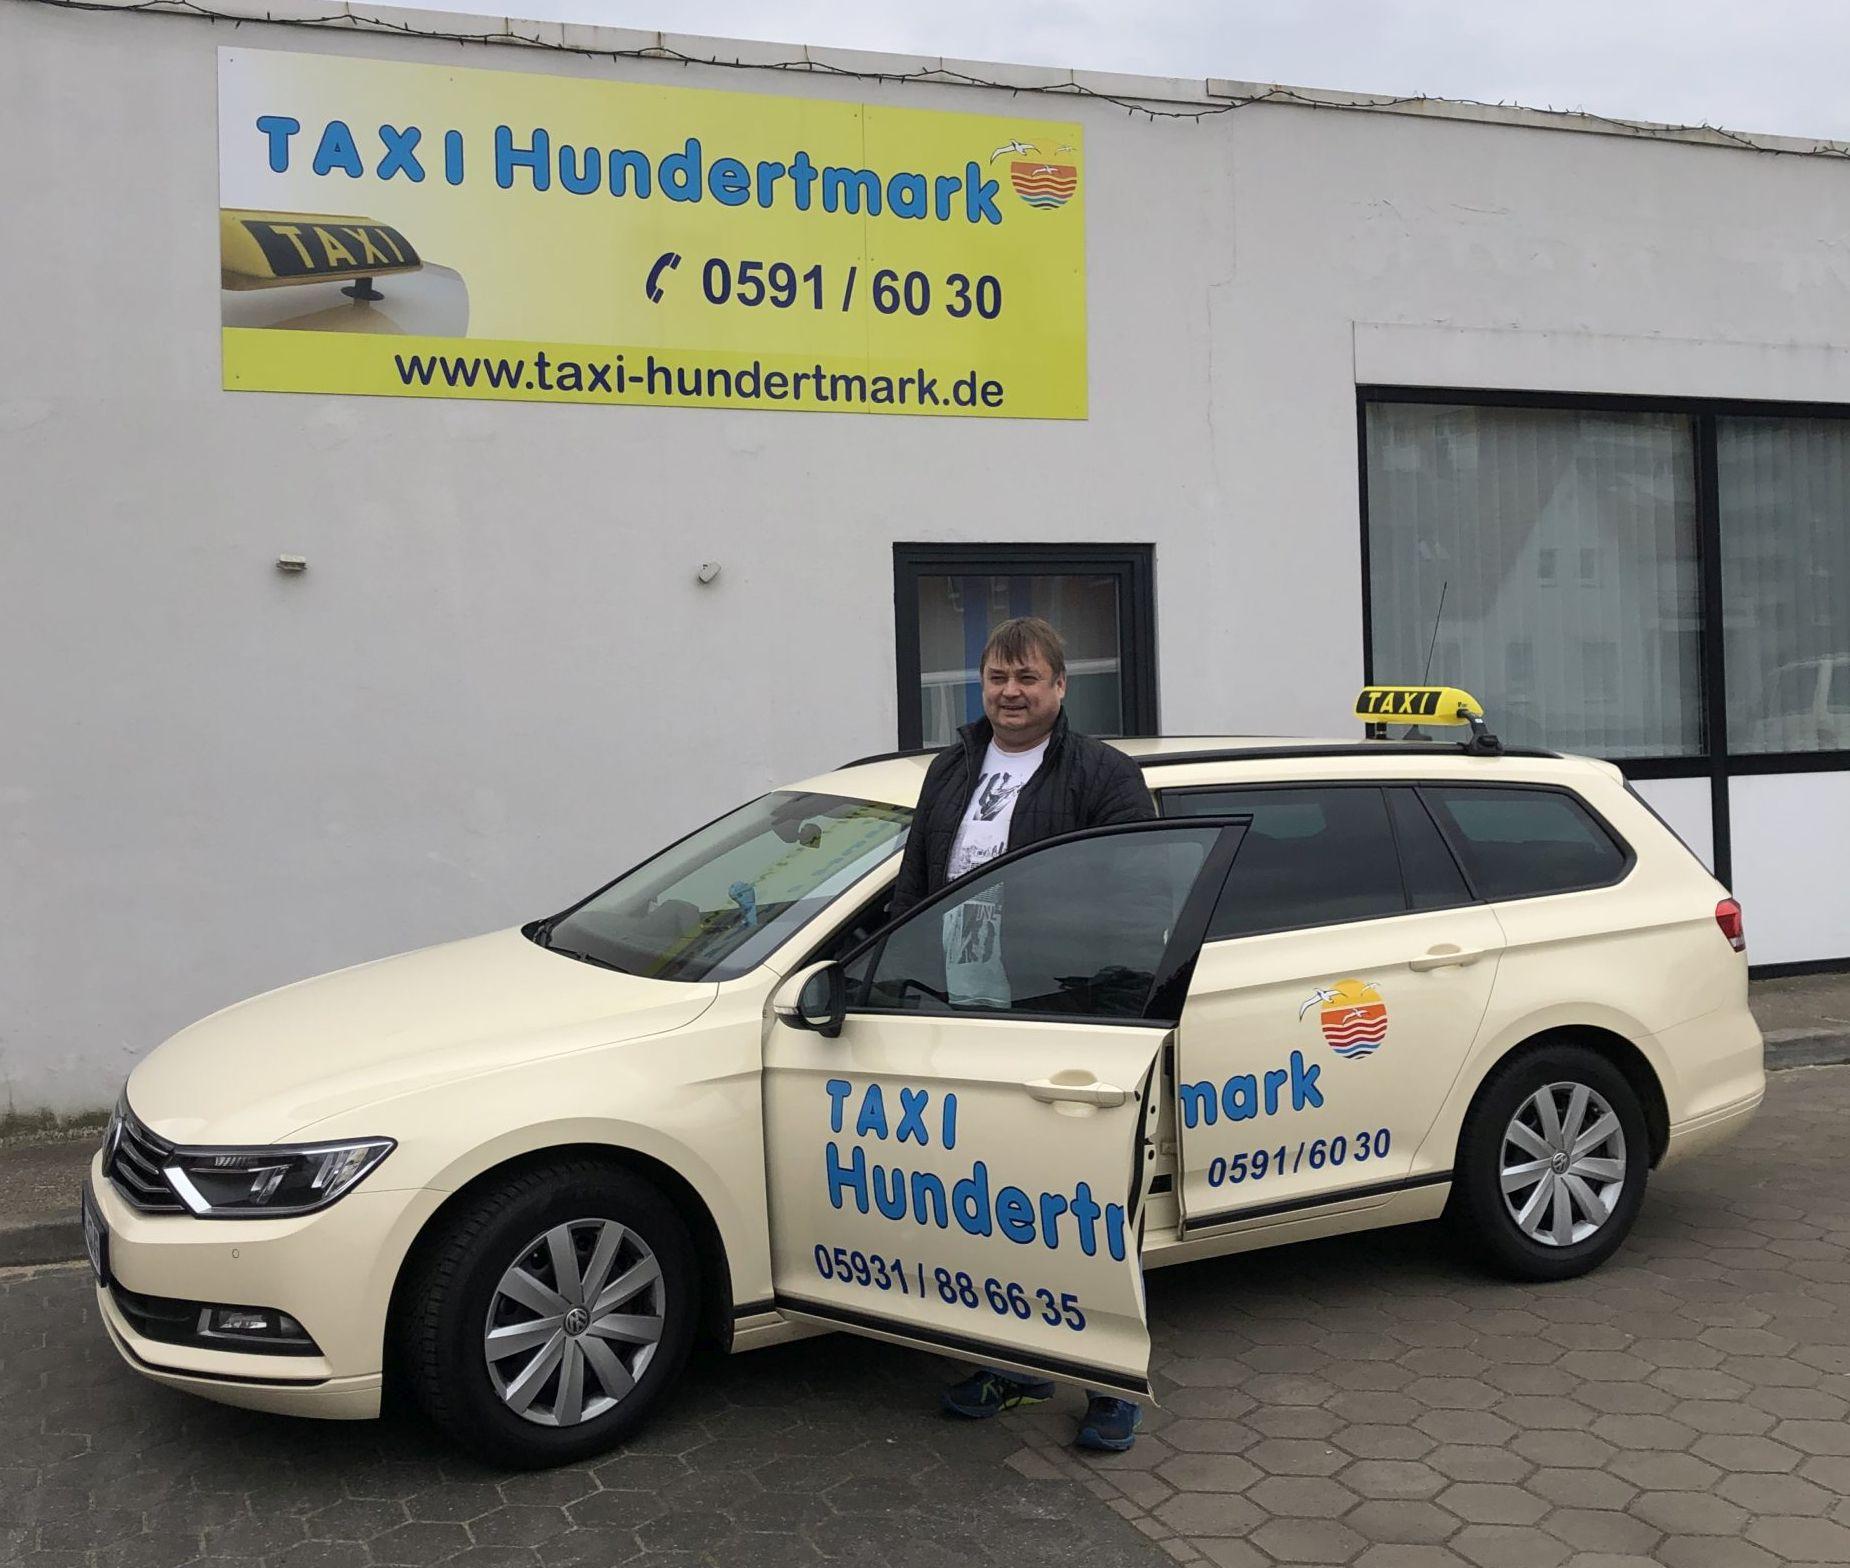 Taxibetrieb Hundertmark Lingen Statement Corona